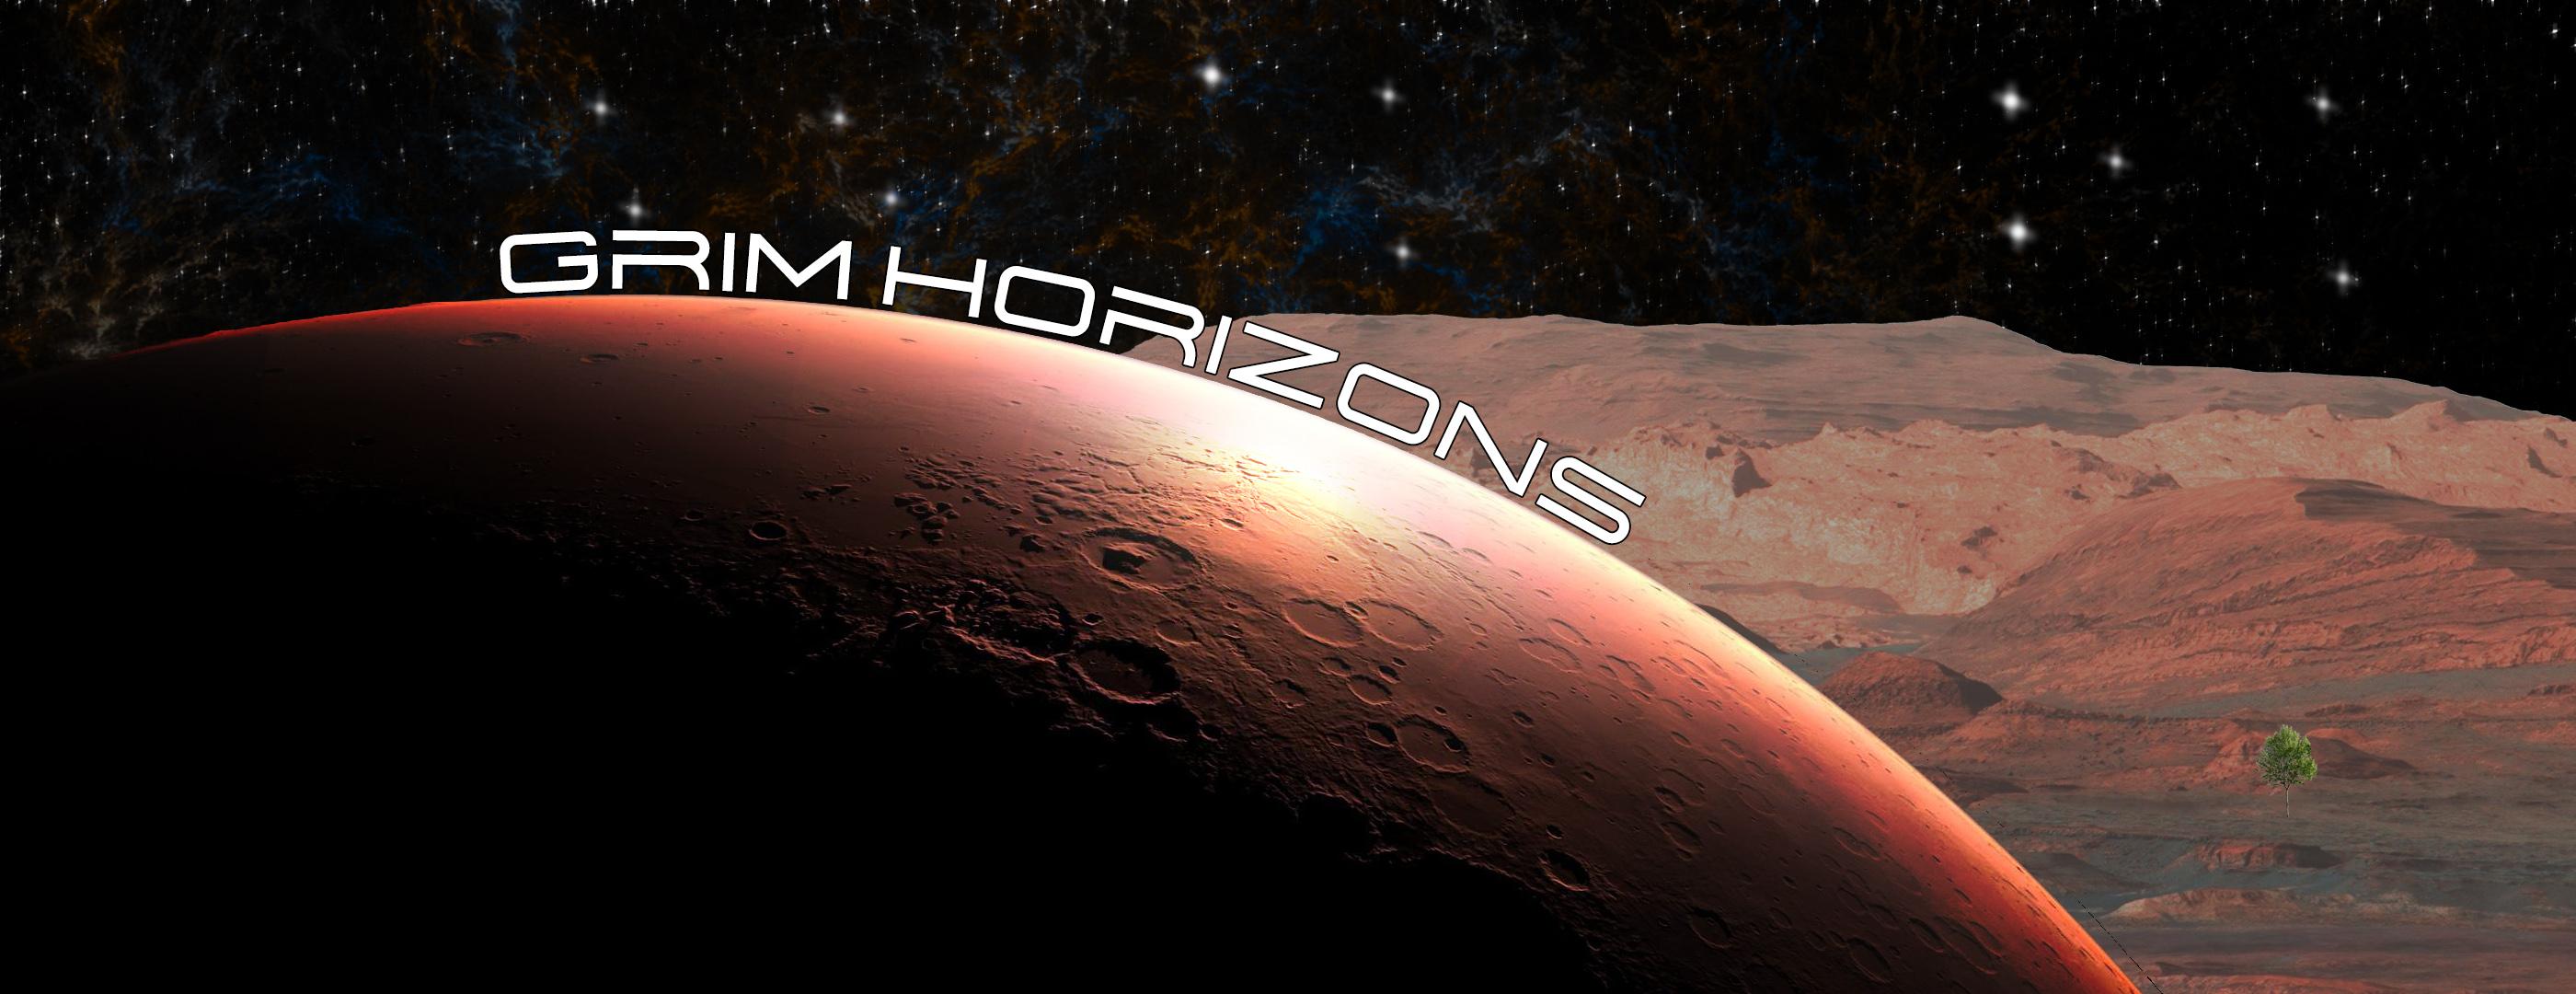 Grim Horizons